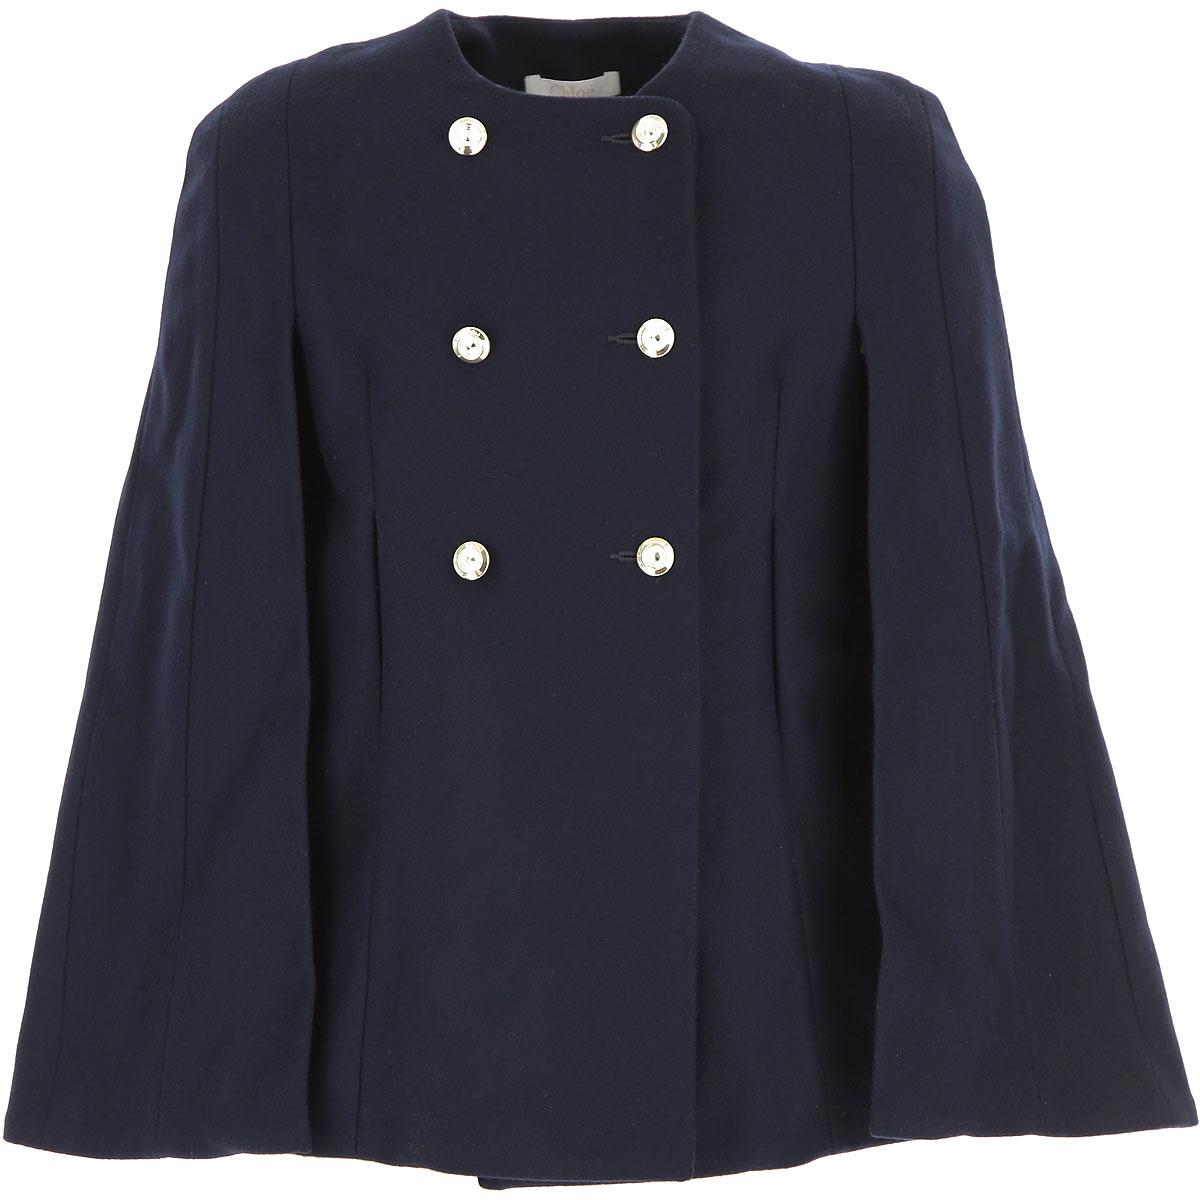 Image of Chloe Kids Jacket for Girls, Blue, Wool, 2017, 10Y 14Y 6Y 8Y